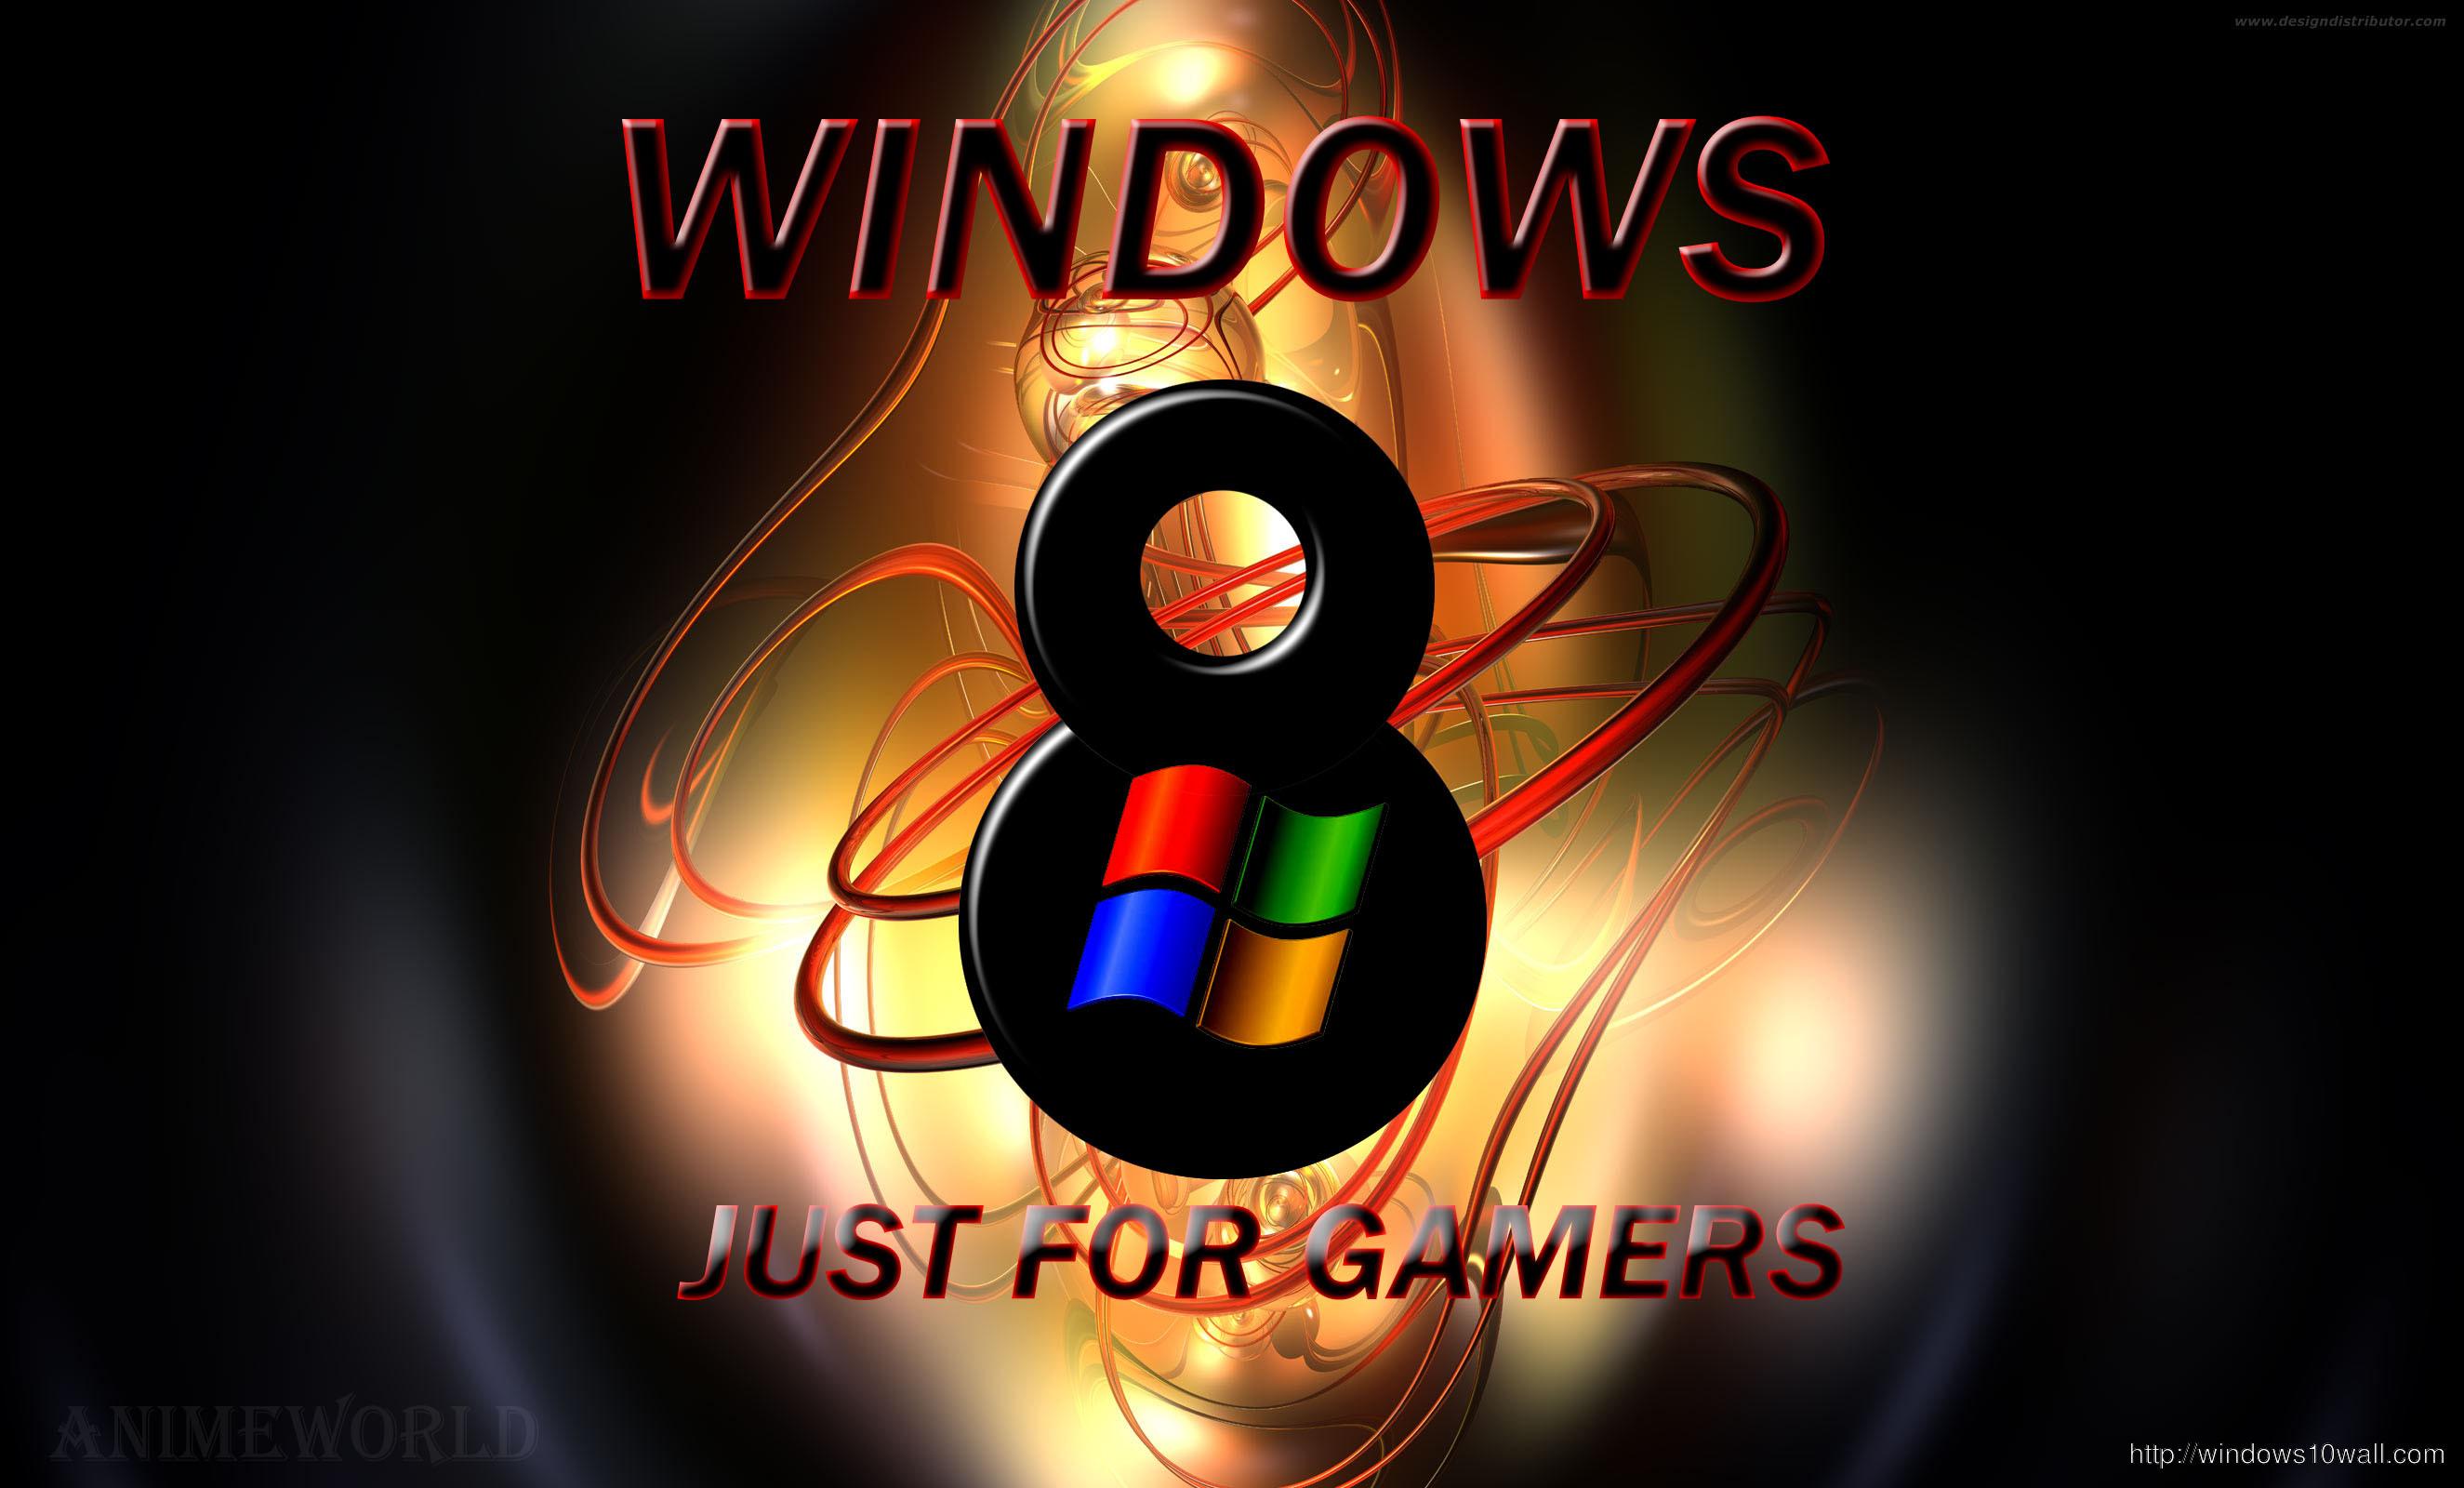 Download Windows 8 Wallpapers for pc desktop